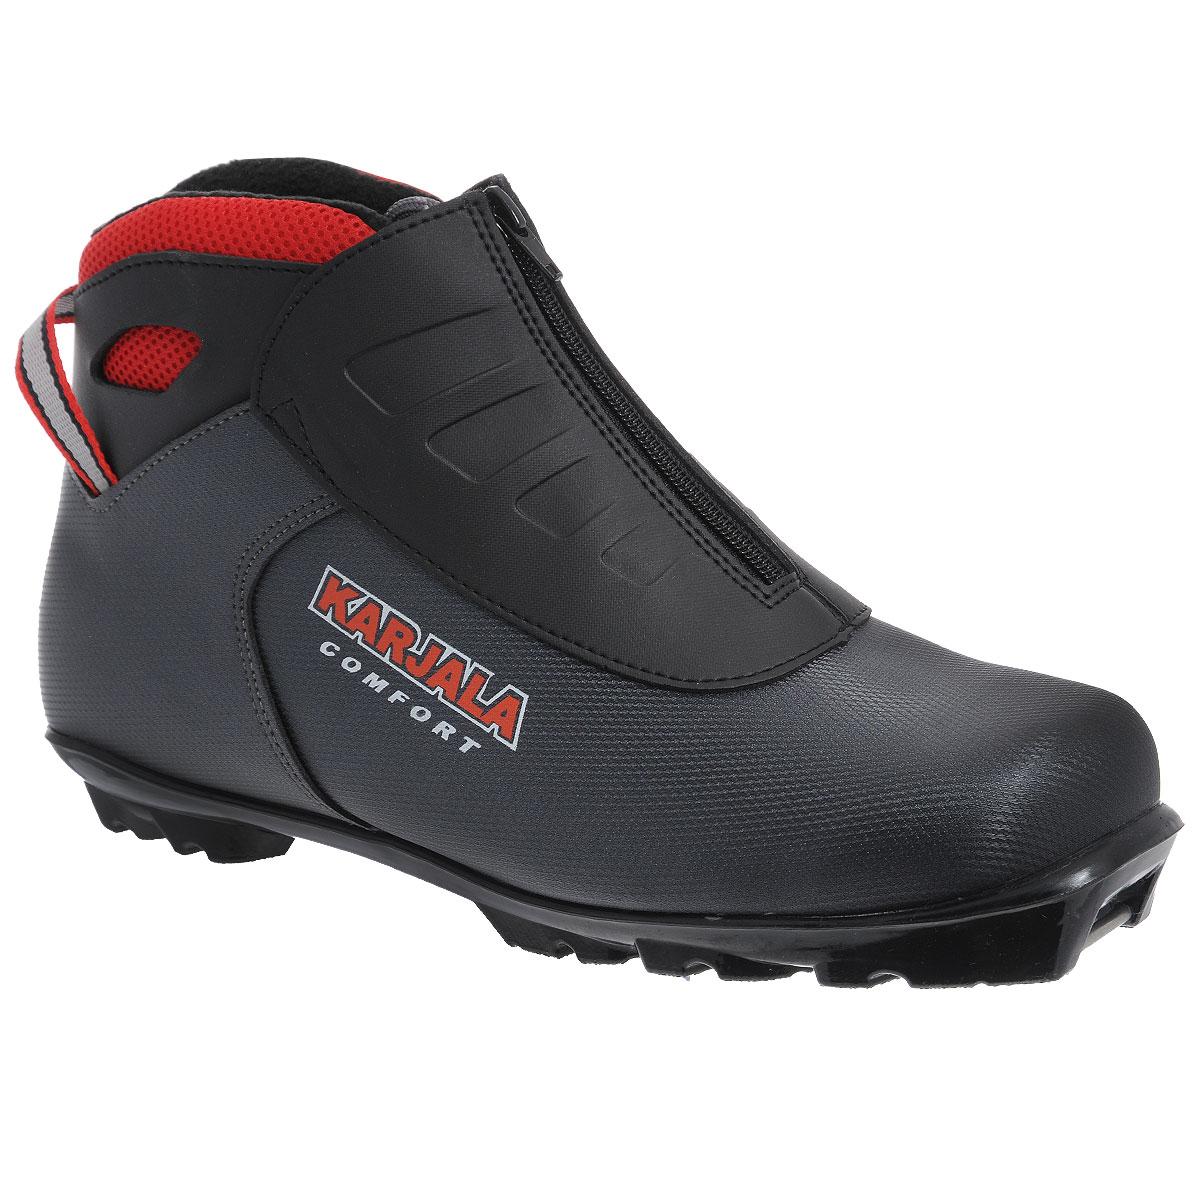 Karjala (Карелия) Ботинки для беговых лыж Comfort NNN